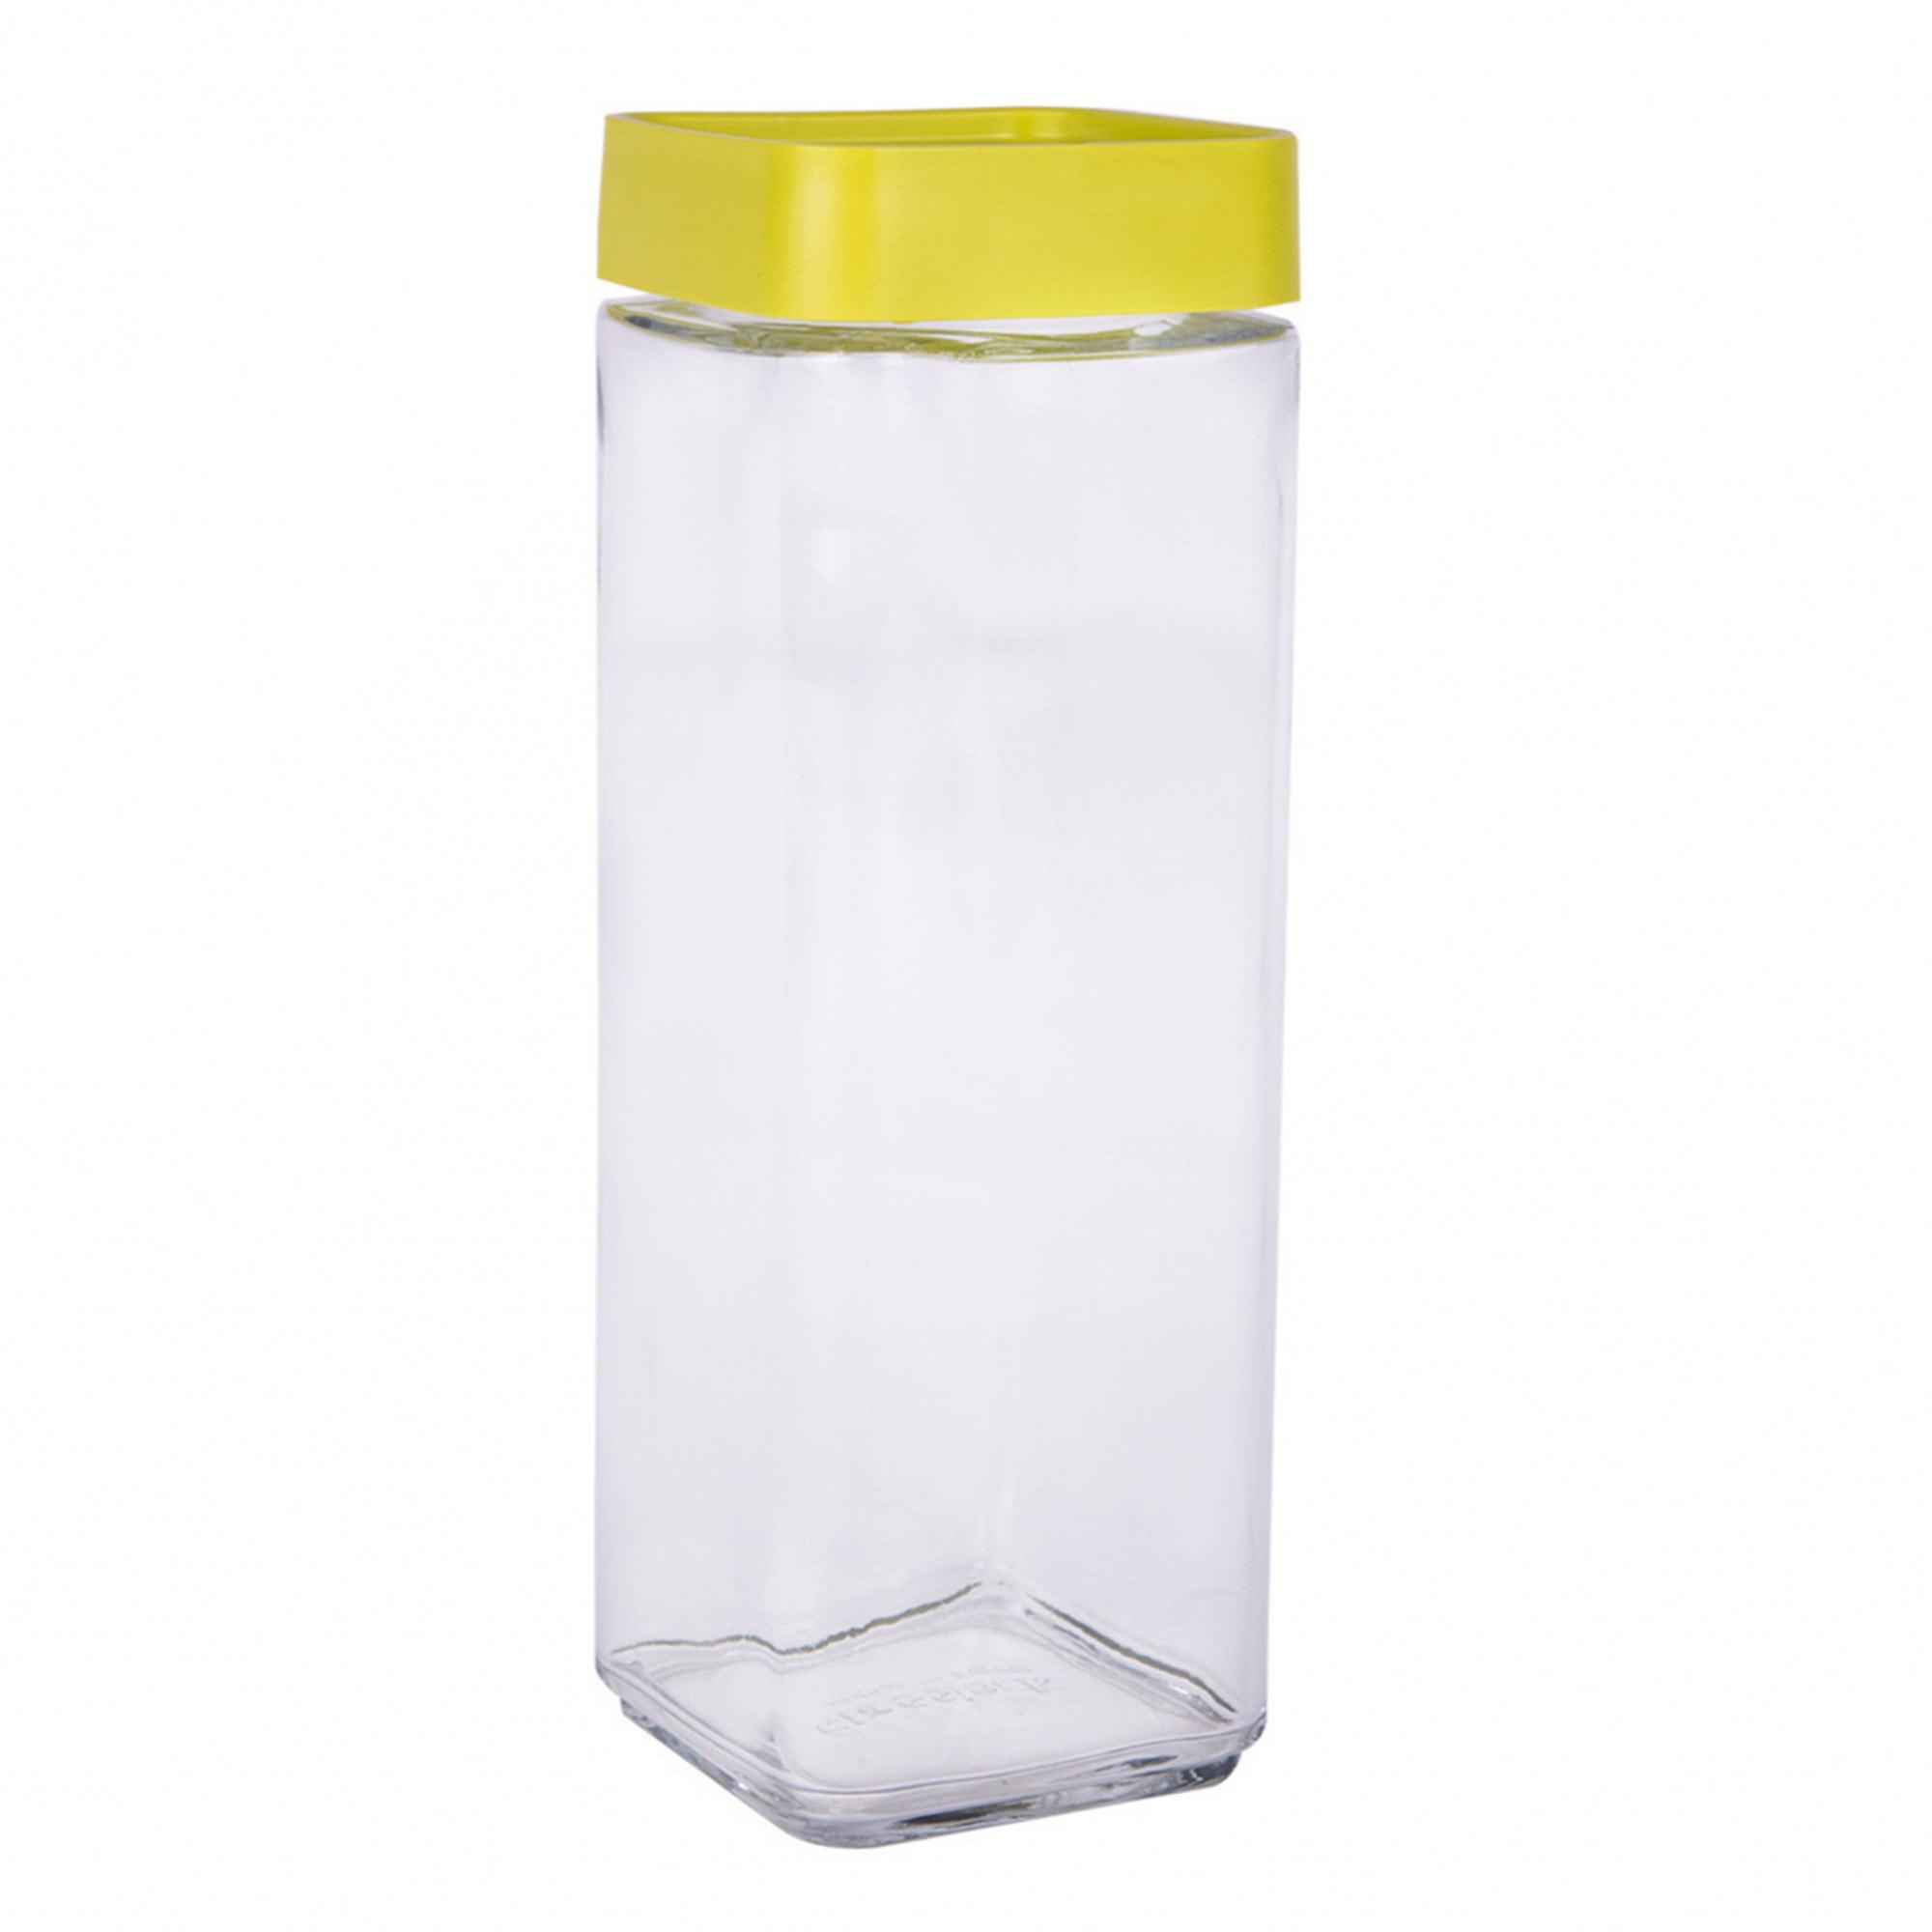 Фото - Контейнер Glasslock IP-606 1,3 л банка для хранения солений ягод варенья 4 л 16х13 5х29 см ip 636 glasslock